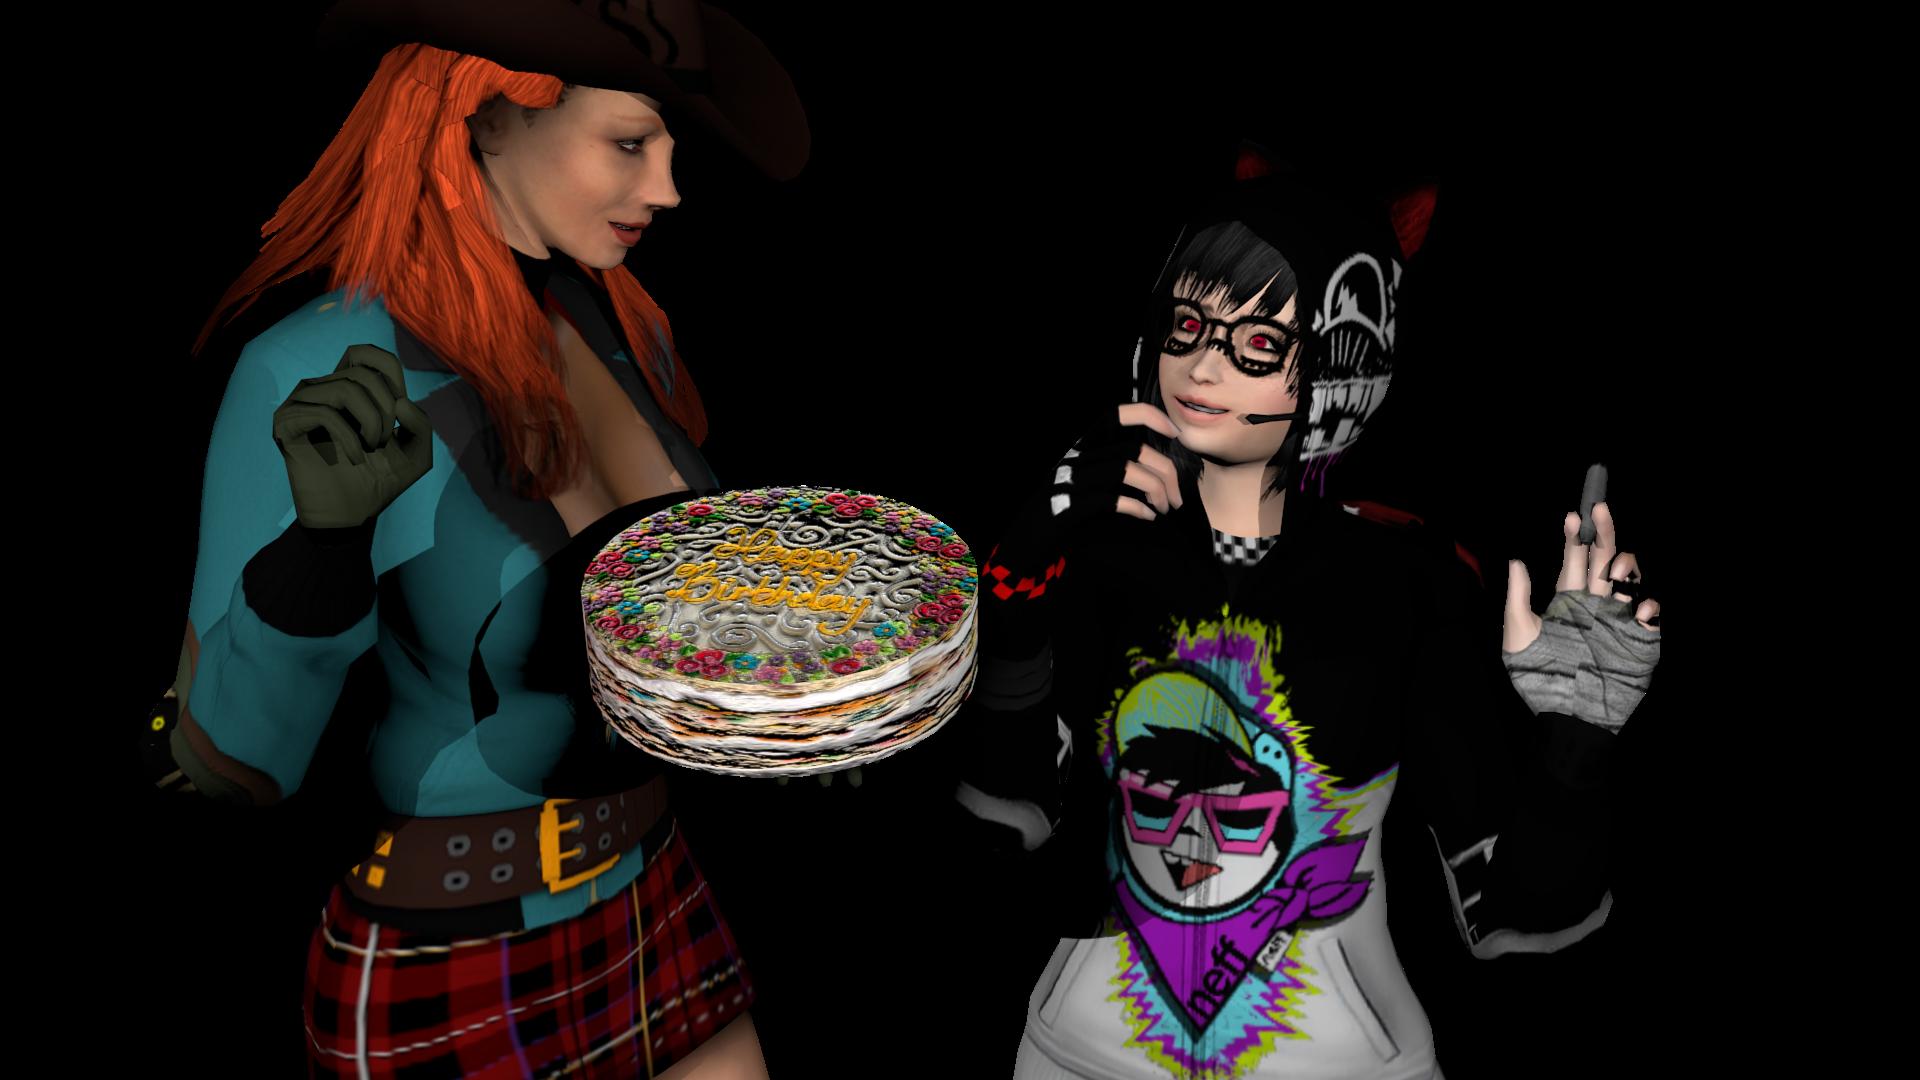 adragonloli_birthday2019.png